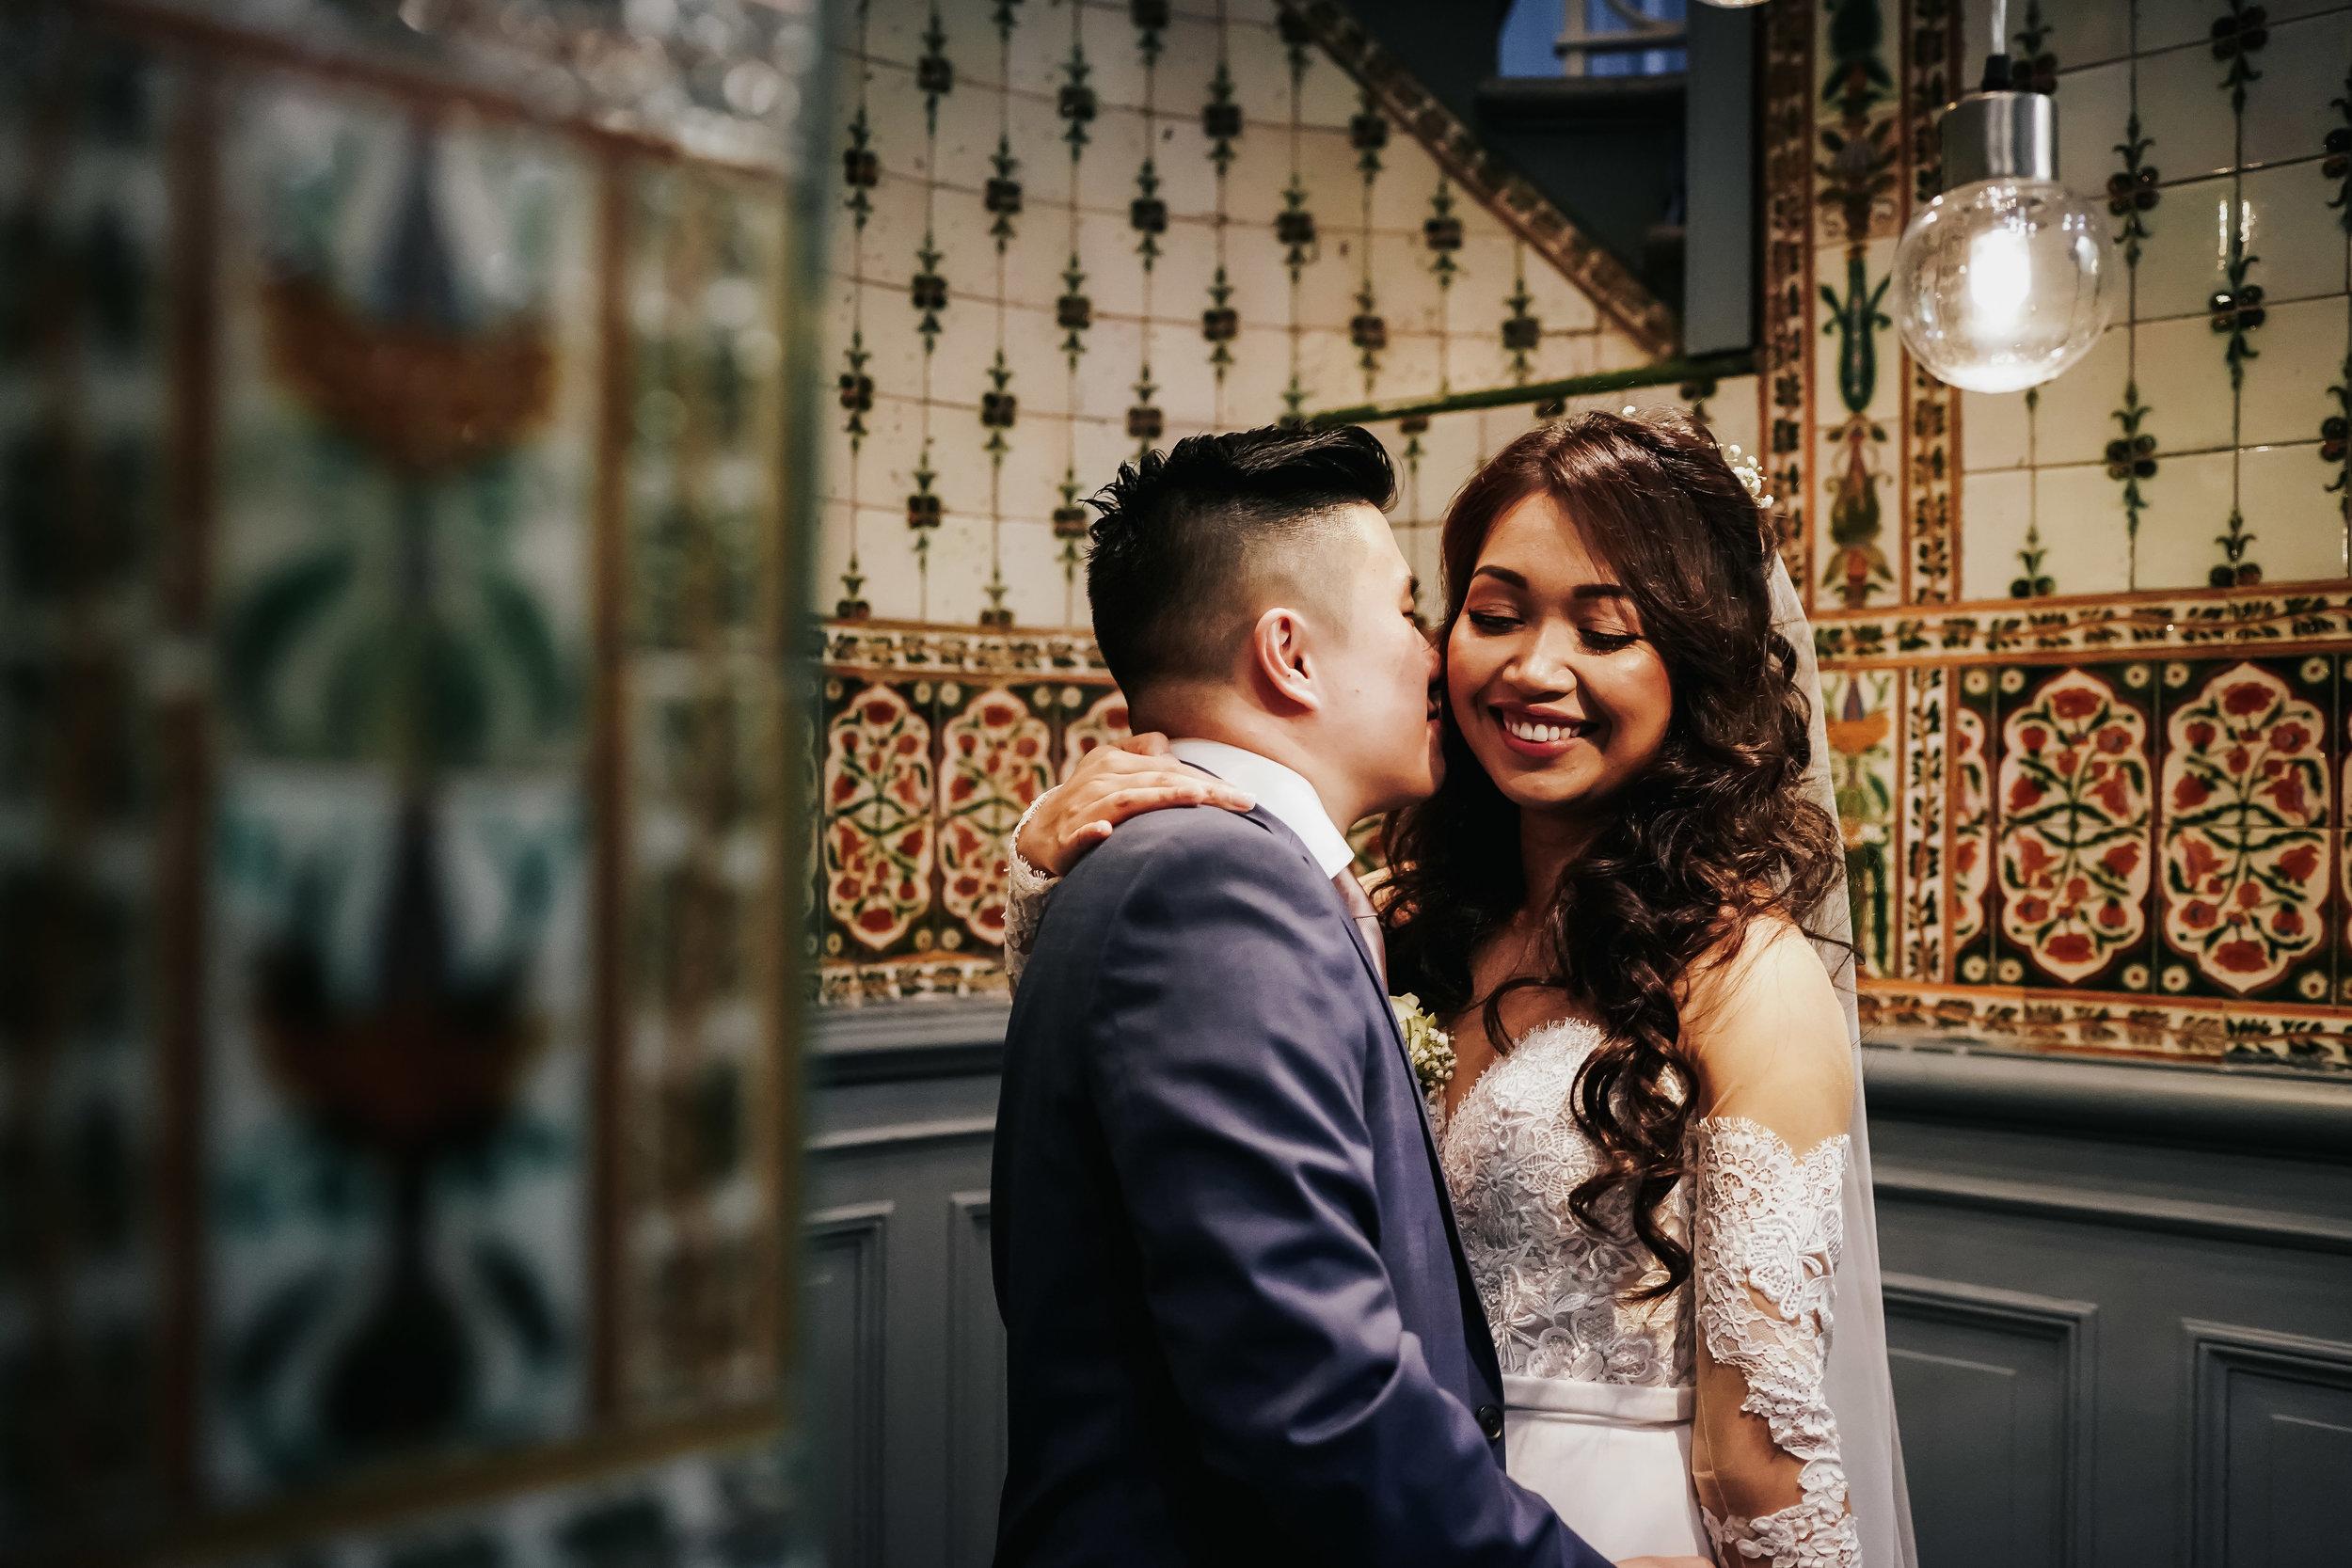 Chinese Wedding Photography Manchester wedding photographer Cheshire - 025.jpg